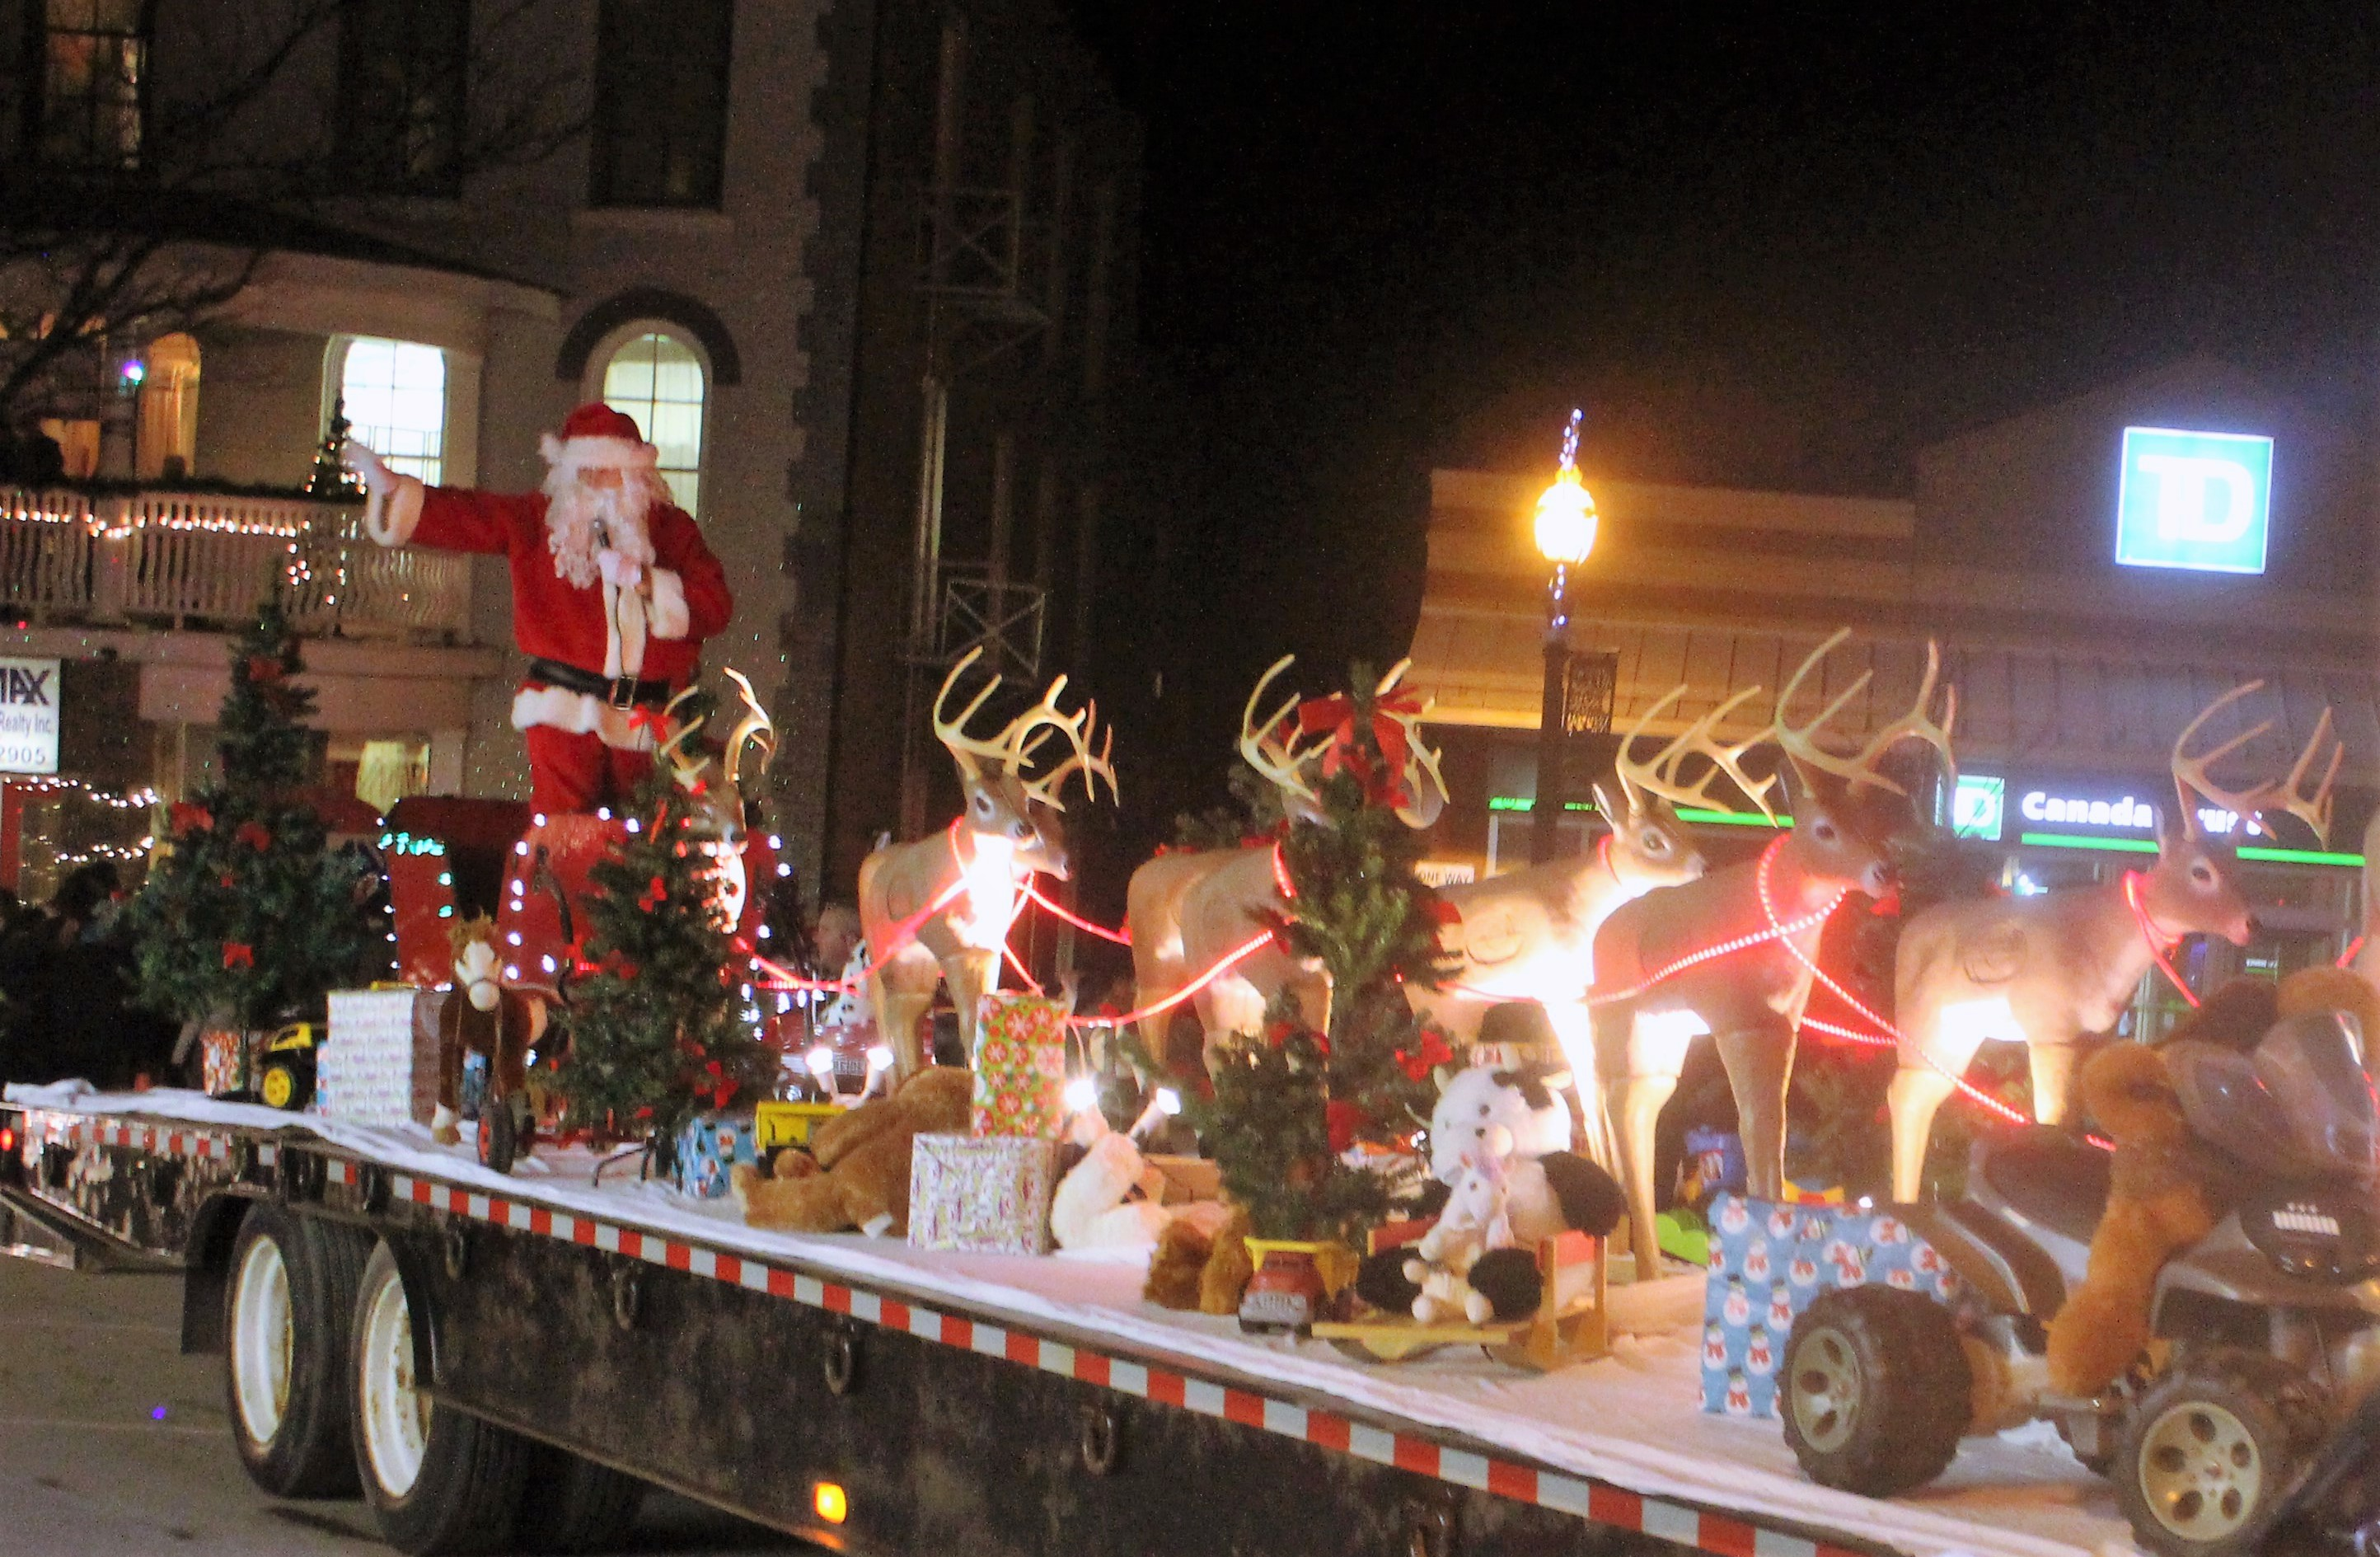 Santa's first stop in Brock comes Friday night in Beaverton